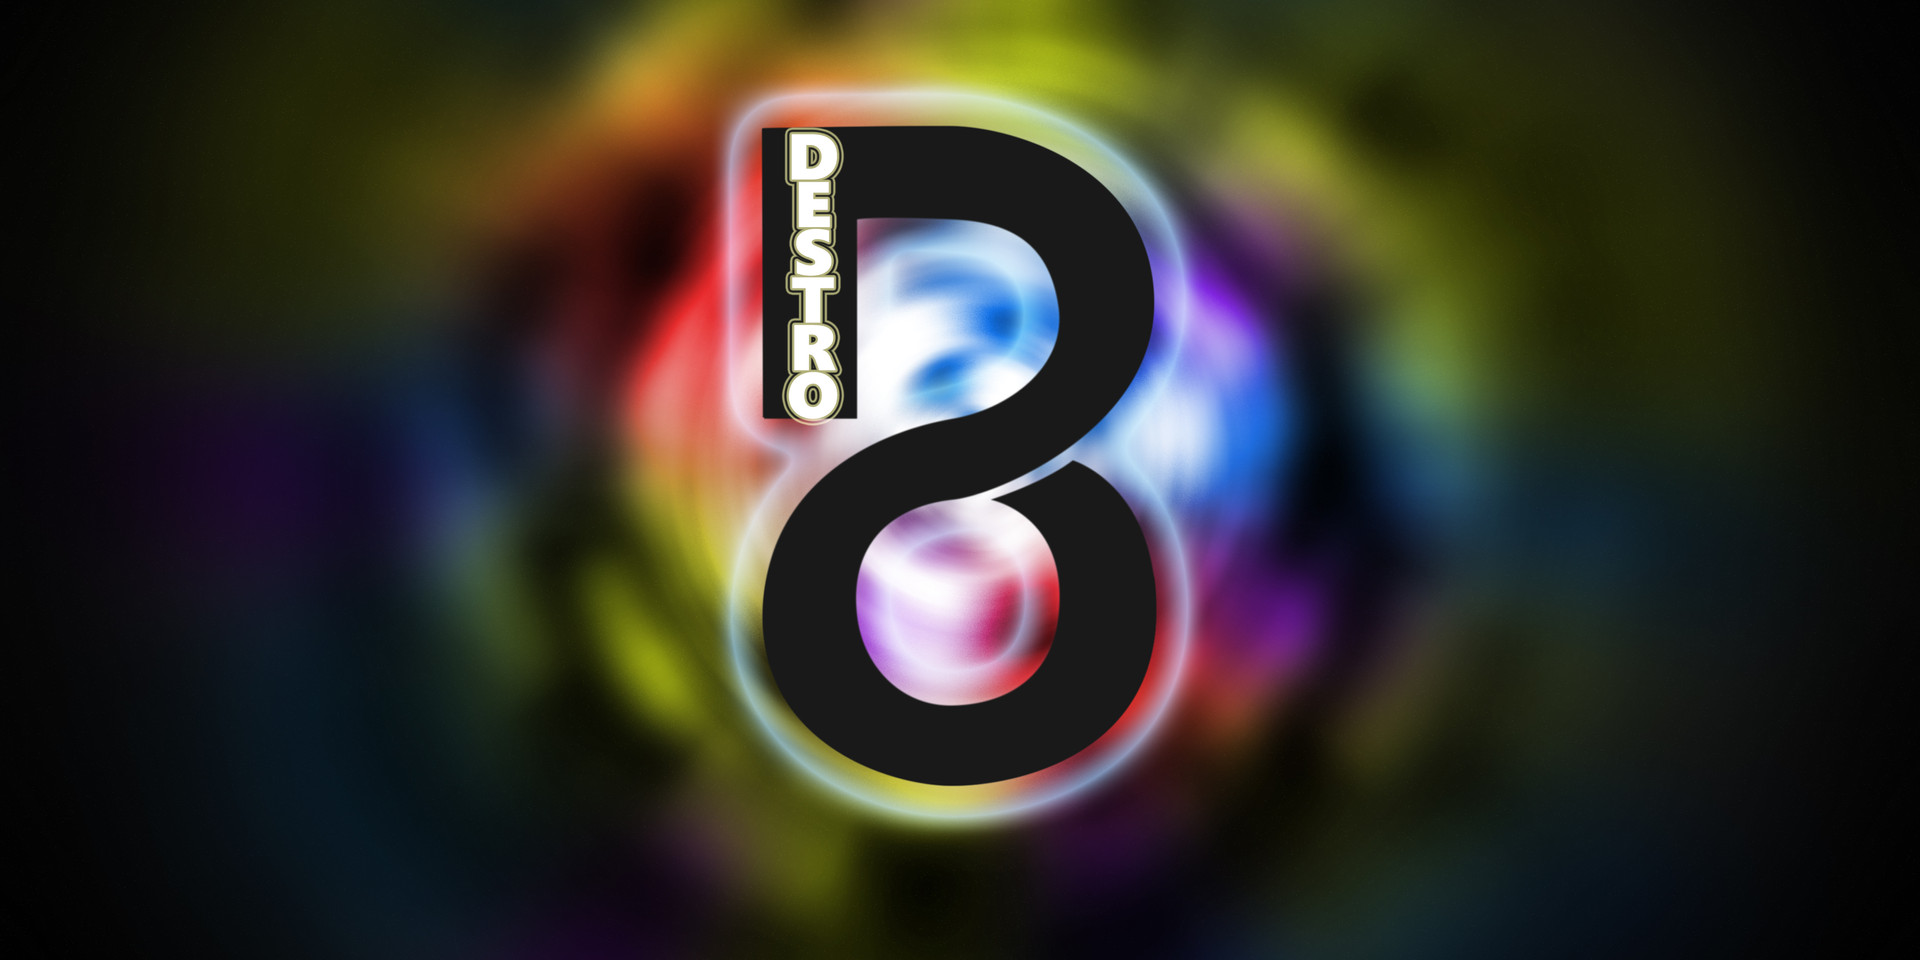 Destro Logo Image.jpg